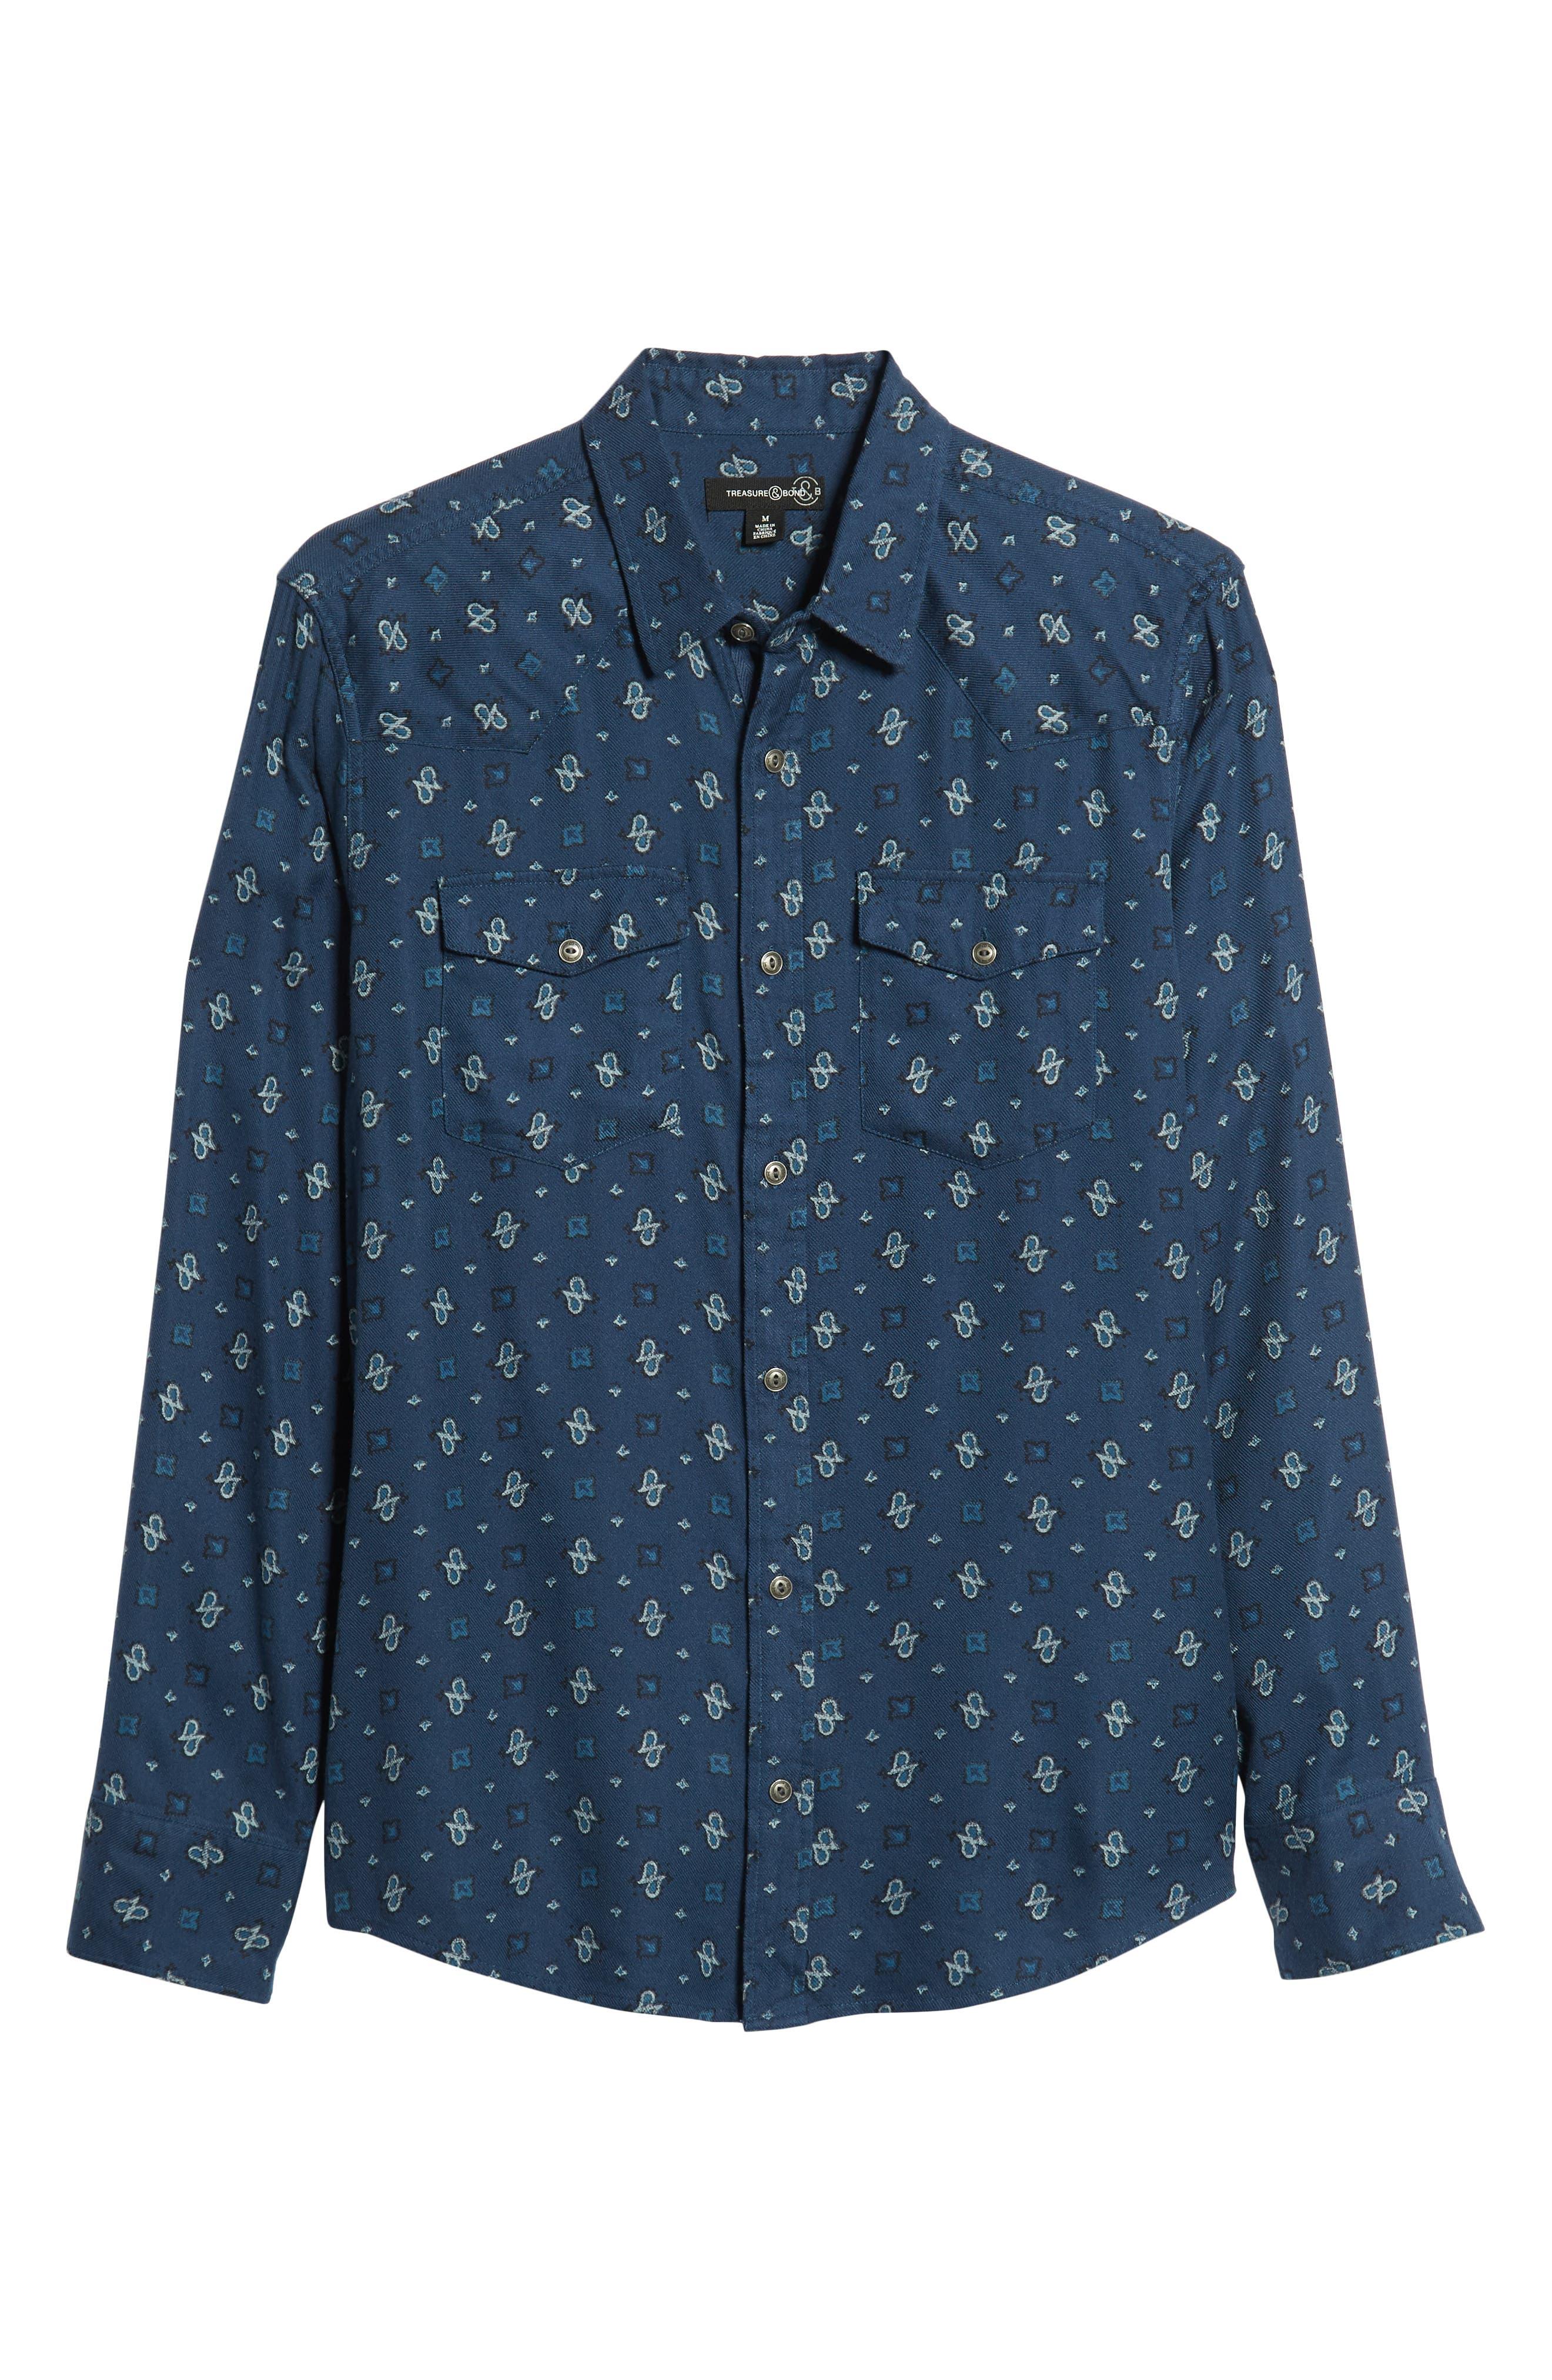 Regular Fit Paisley Western Shirt,                             Alternate thumbnail 5, color,                             BLUE CASPIA DESERT PAISLEY